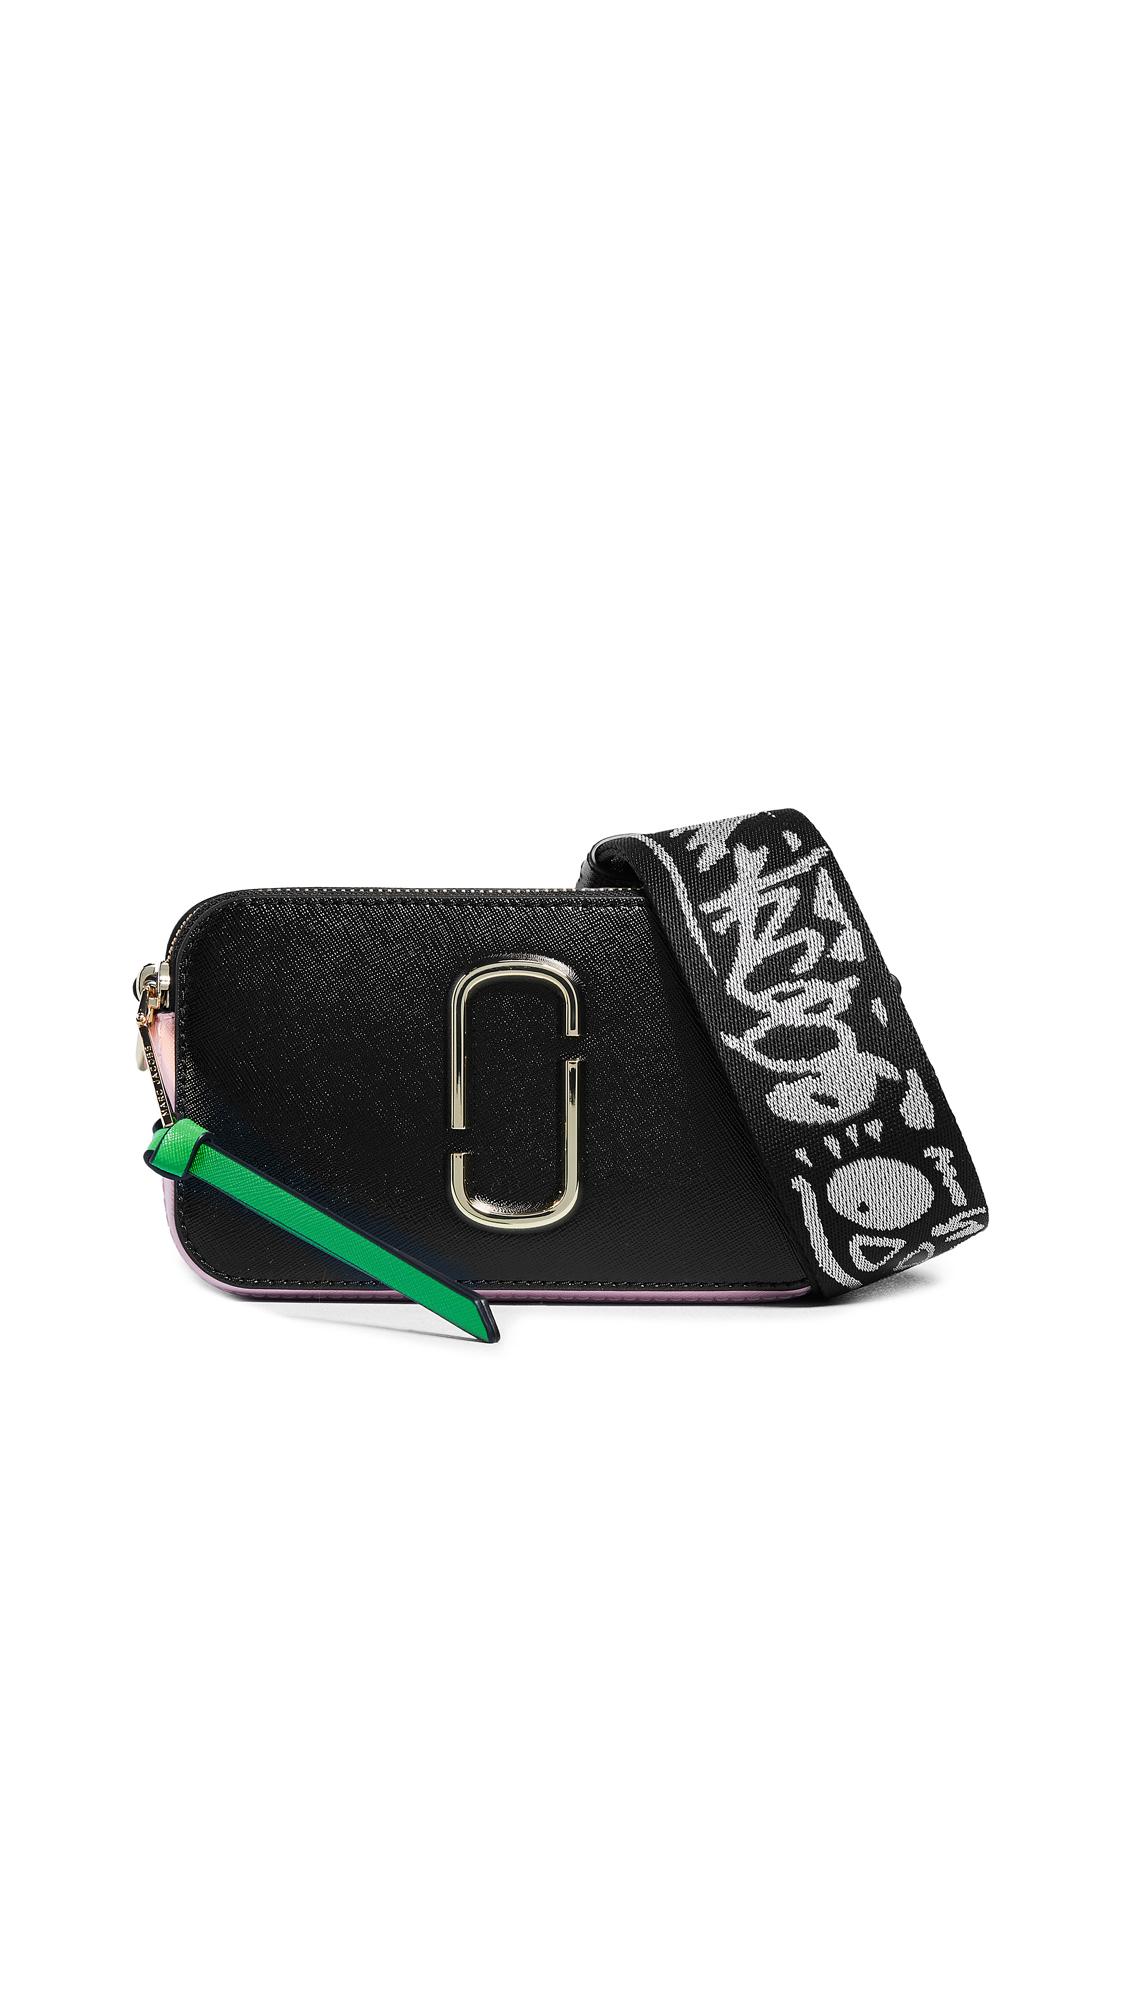 Marc Jacobs Snapshot Camera Bag - Black/Baby Pink